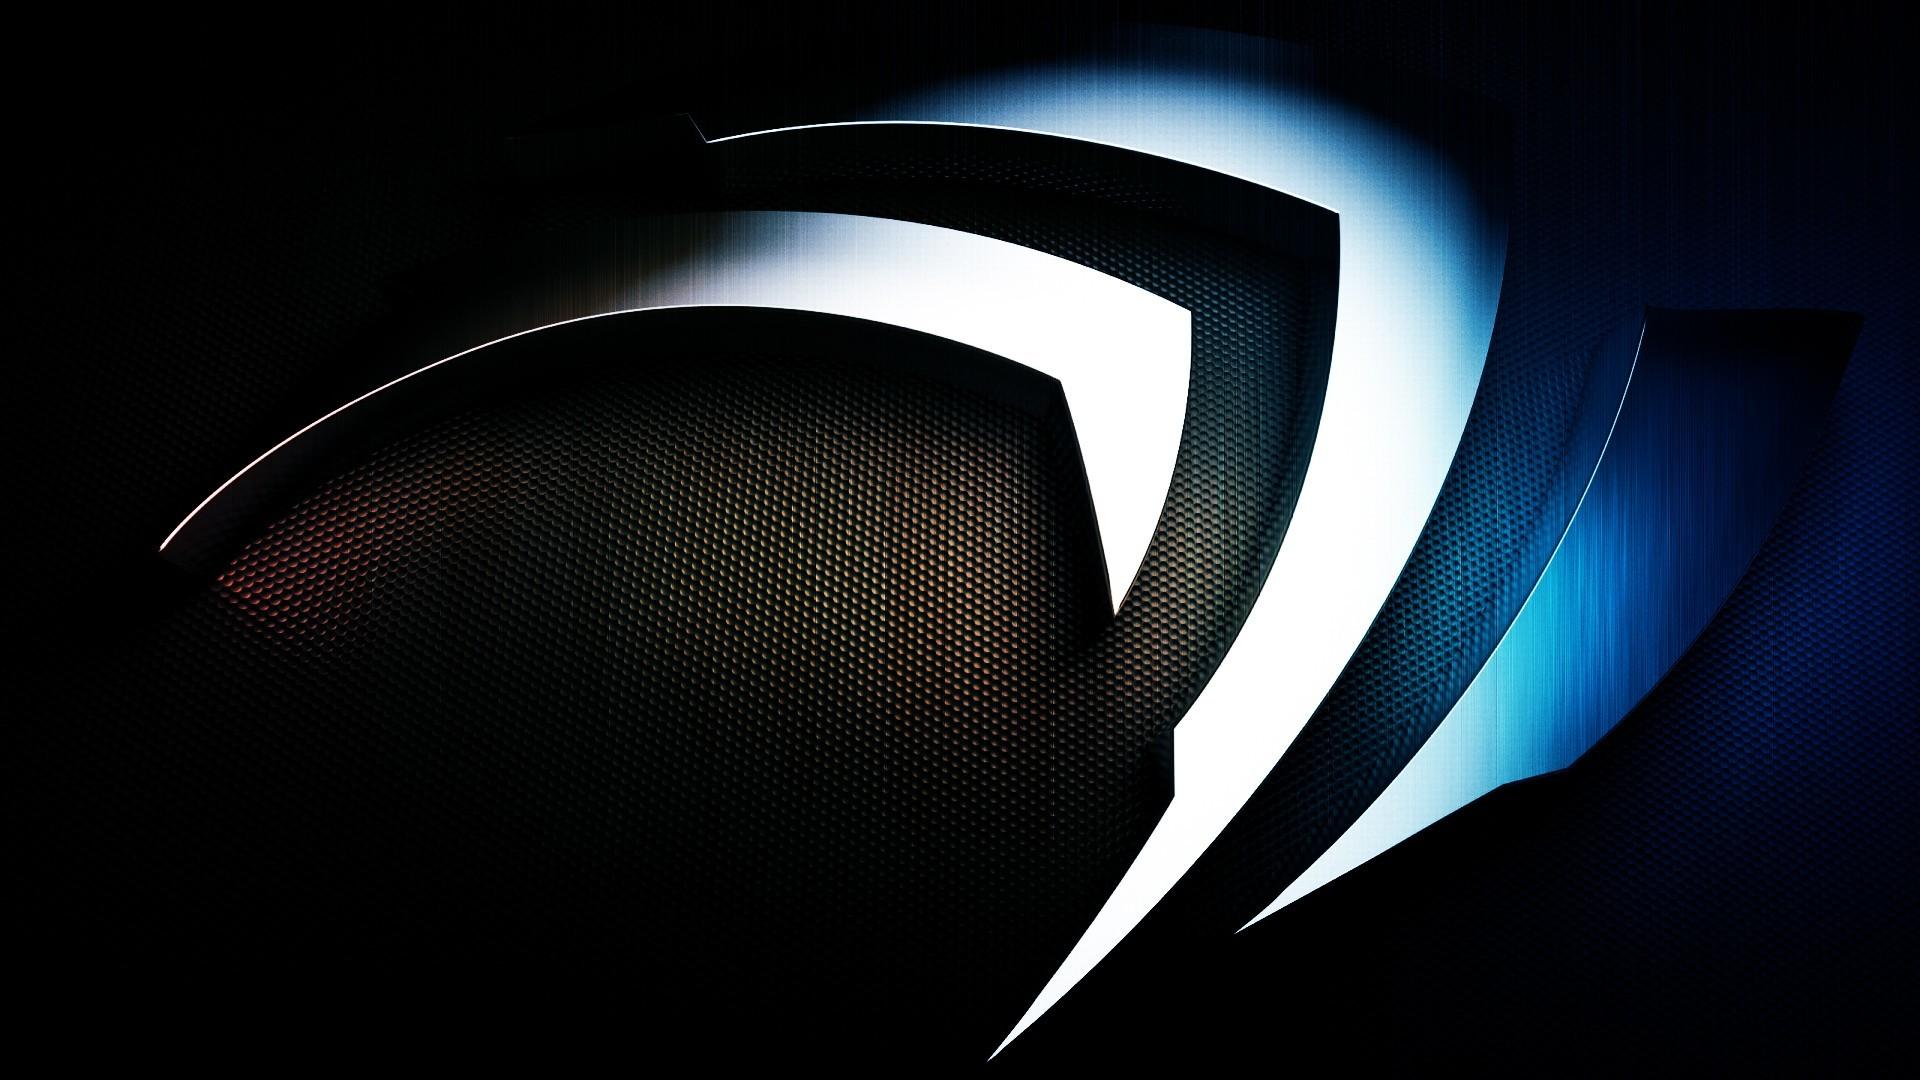 nvidia Computer Wallpapers Desktop Backgrounds 1920x1080 ID 1920x1080